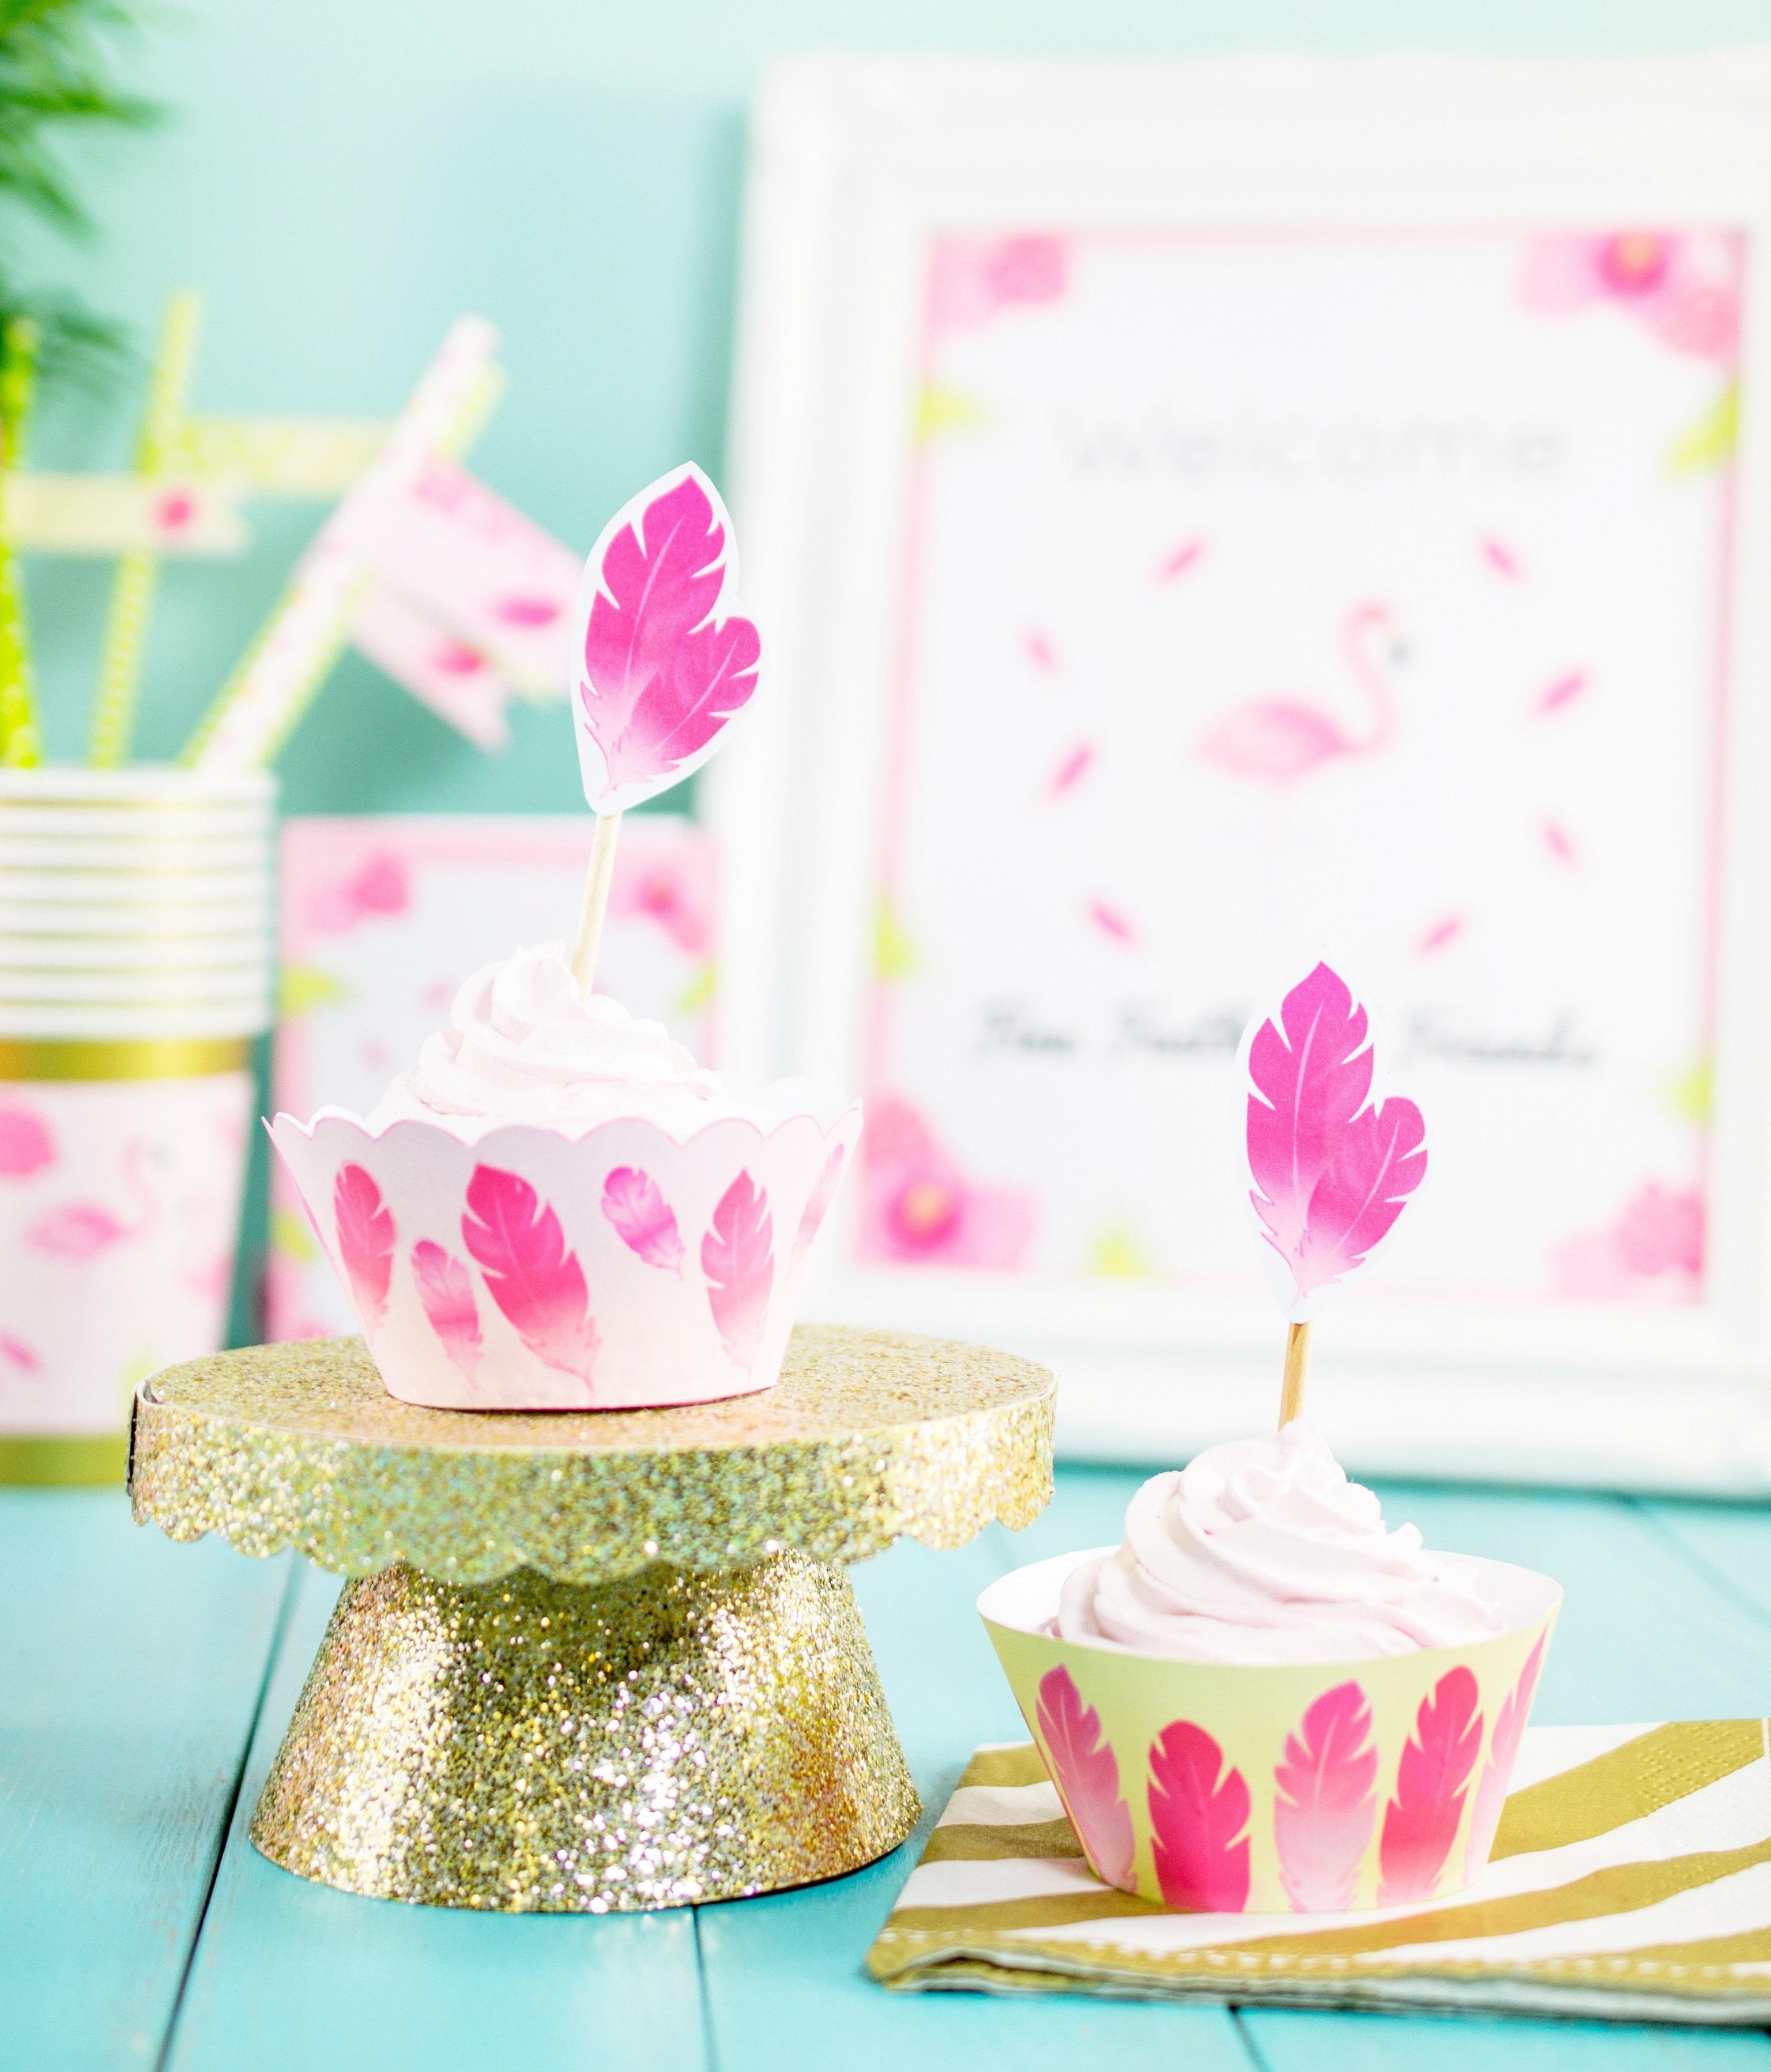 Diy Cardboard Cupcake Stand 183 How To Make A Cake Stand